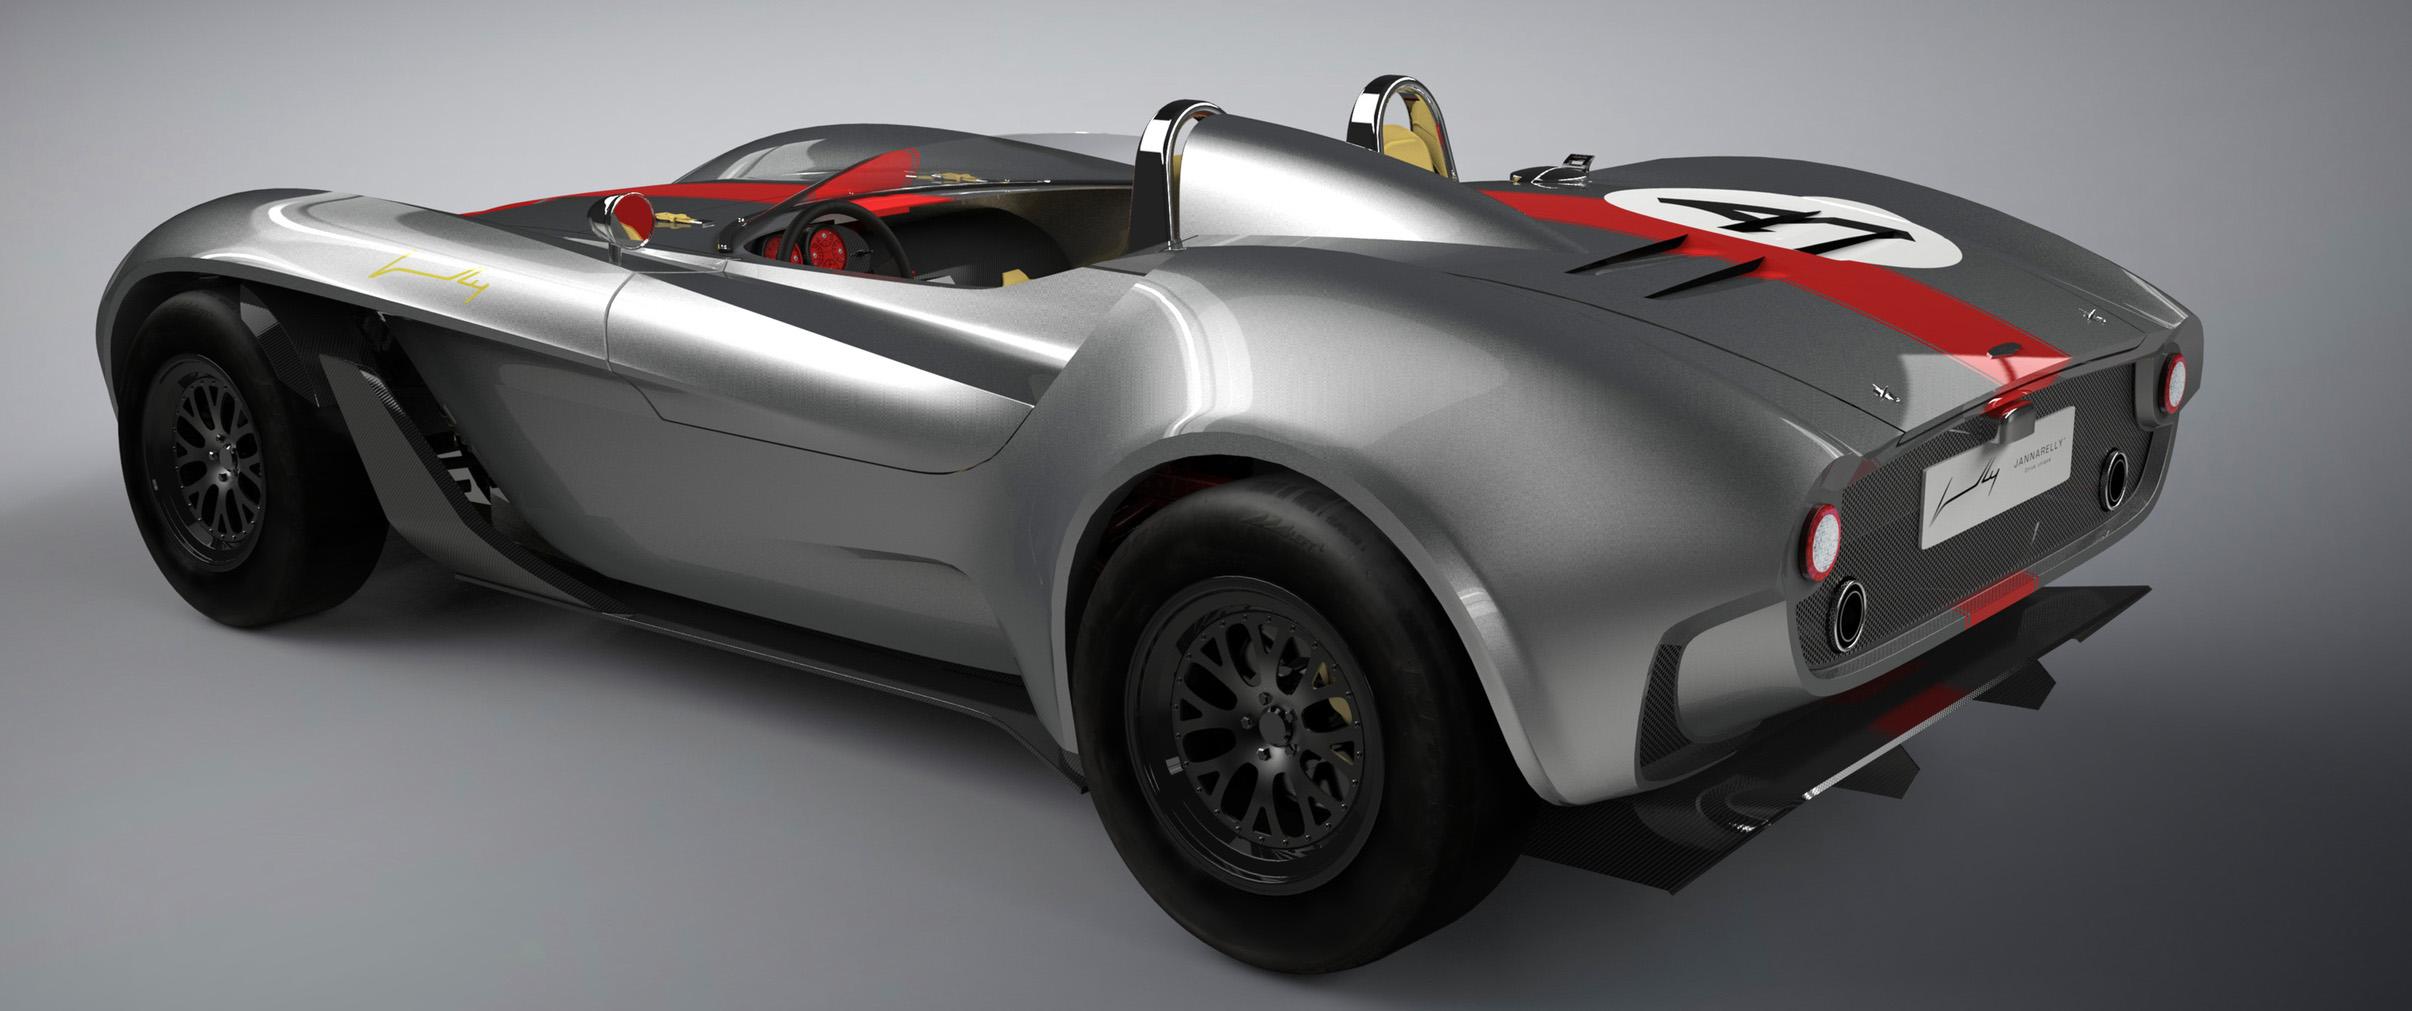 jannarelly-design-1-rear2-gr-a3-1